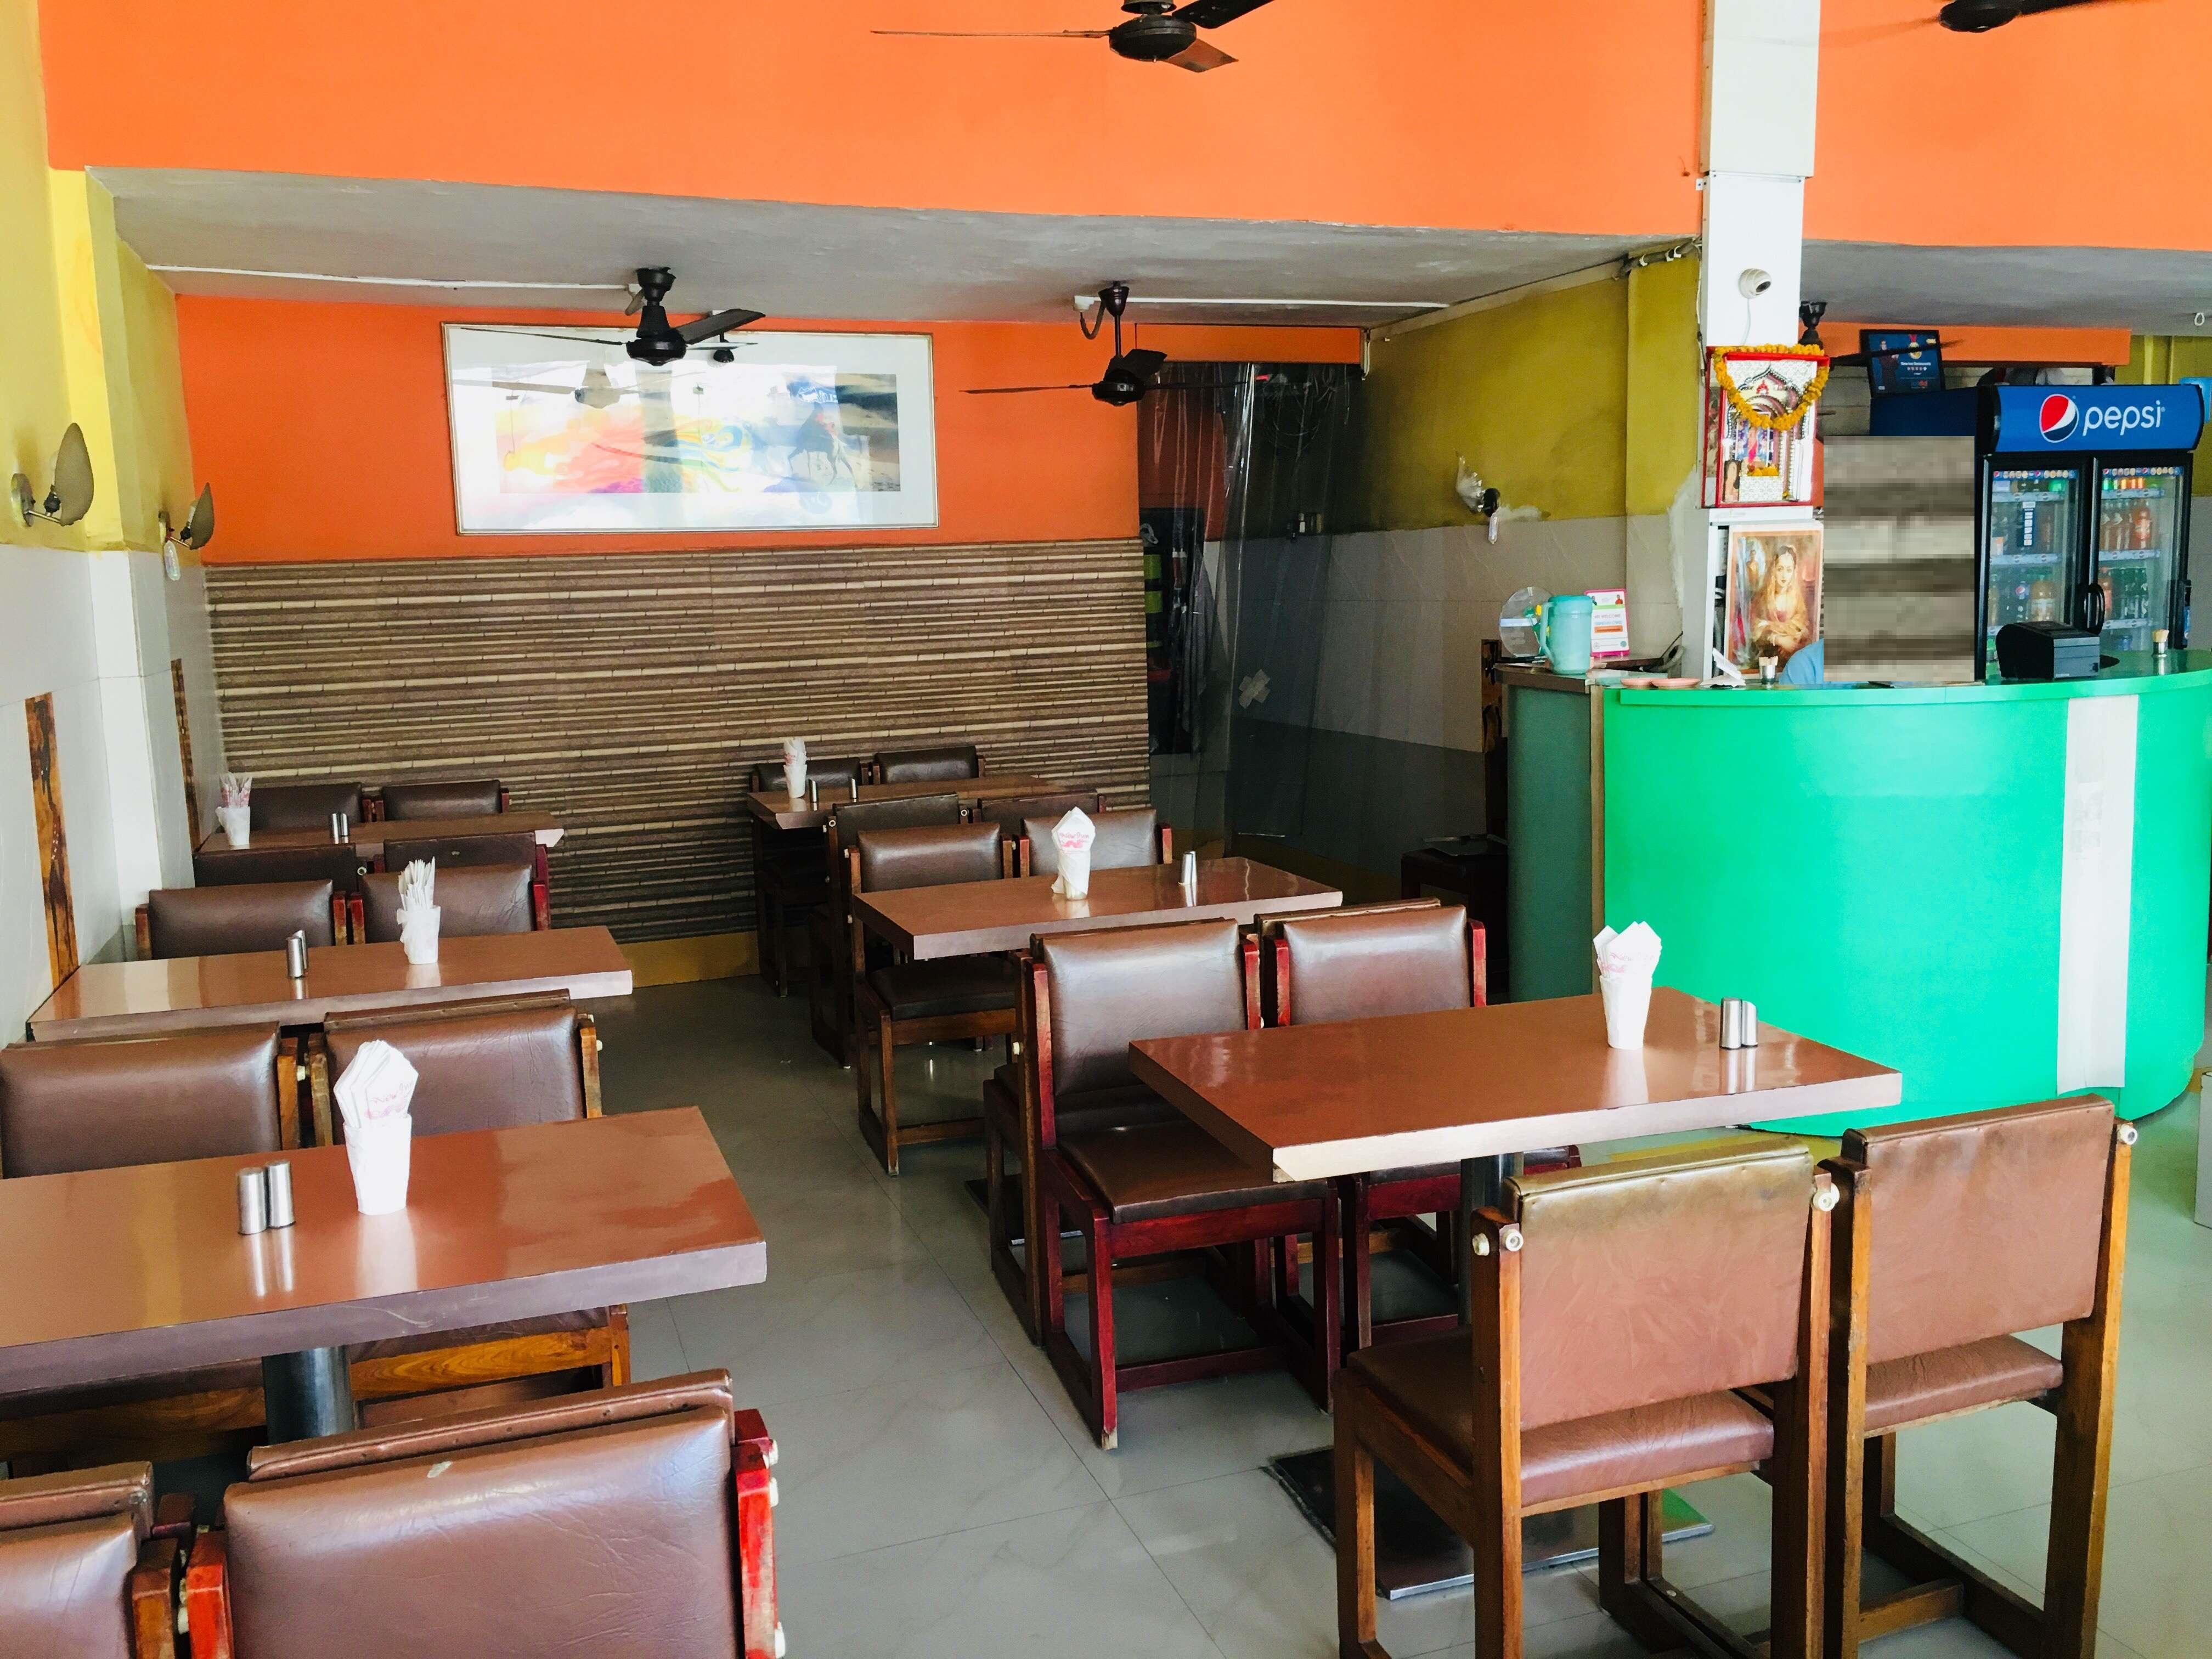 New Inn Restaurant - TT Nagar - Bhopal Image